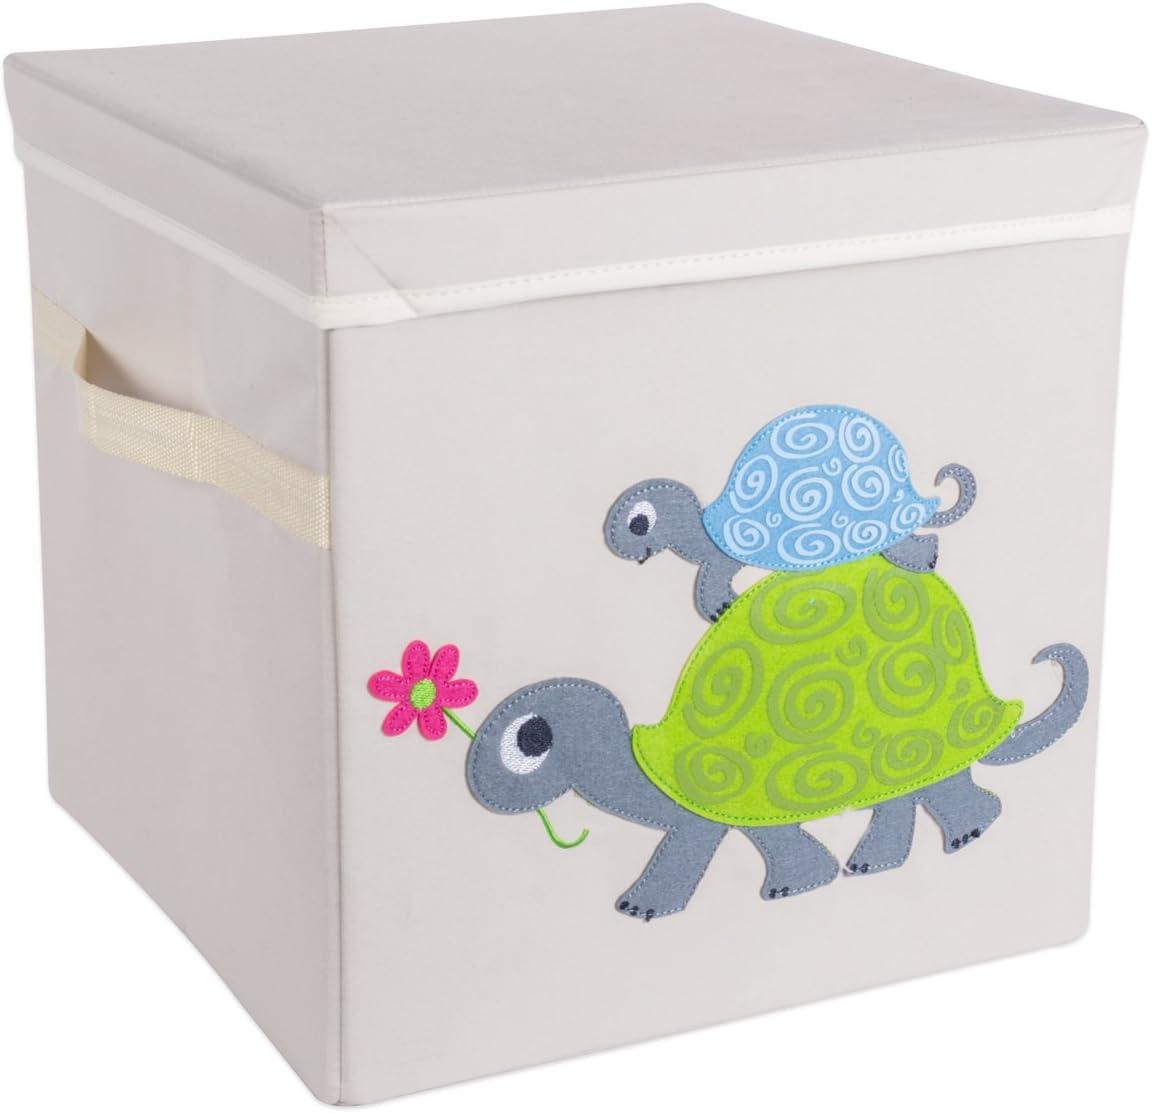 Cube Organizers, 13 x 13 x 13 -Monkey Clothing DII Nursery Storage Bin for Toys Books